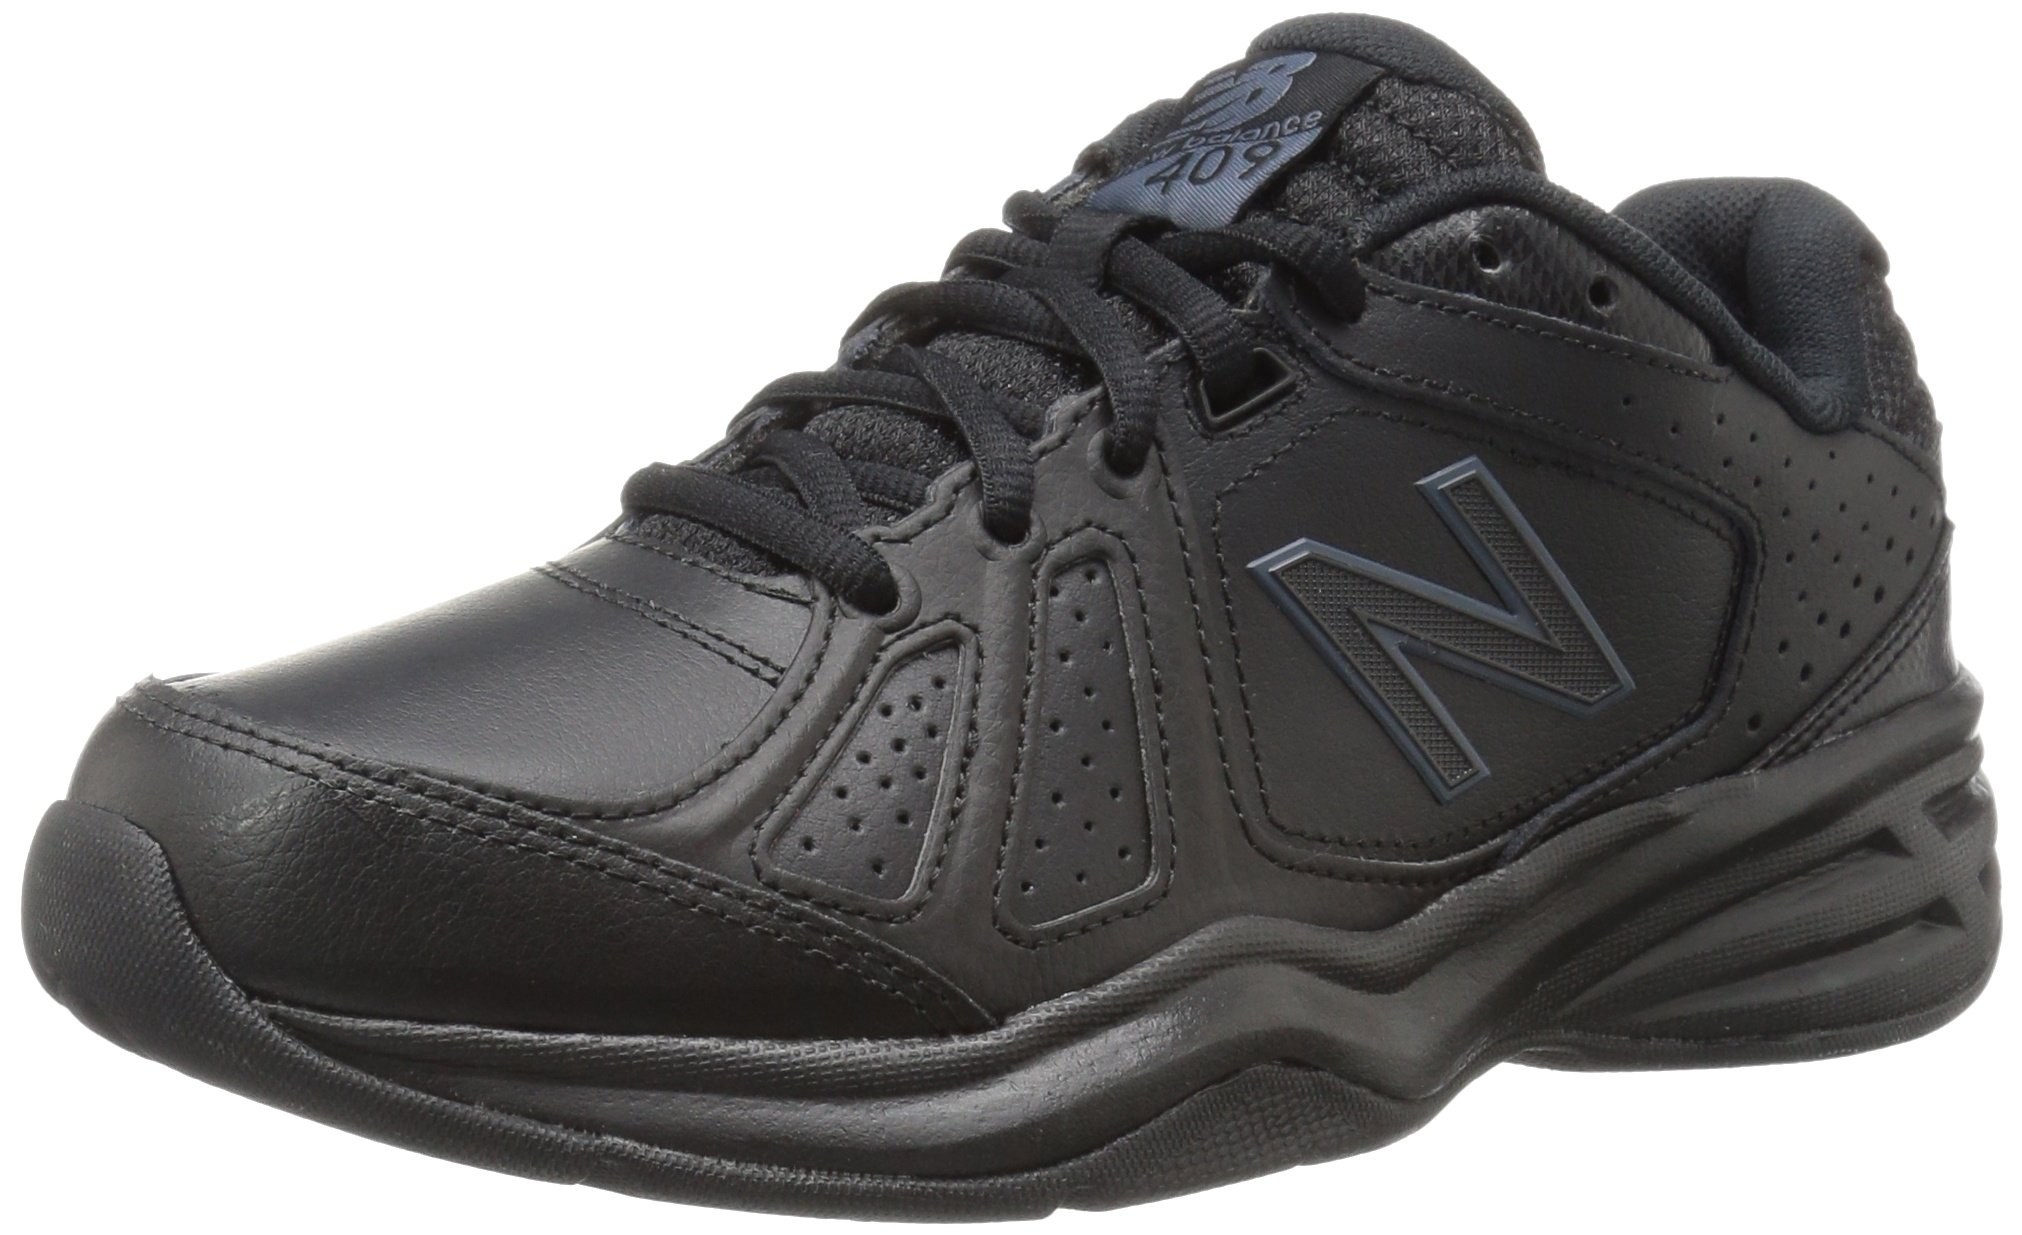 New Balance Women's WX409V3 Casual Comfort Training Shoe, Black, 8 B US